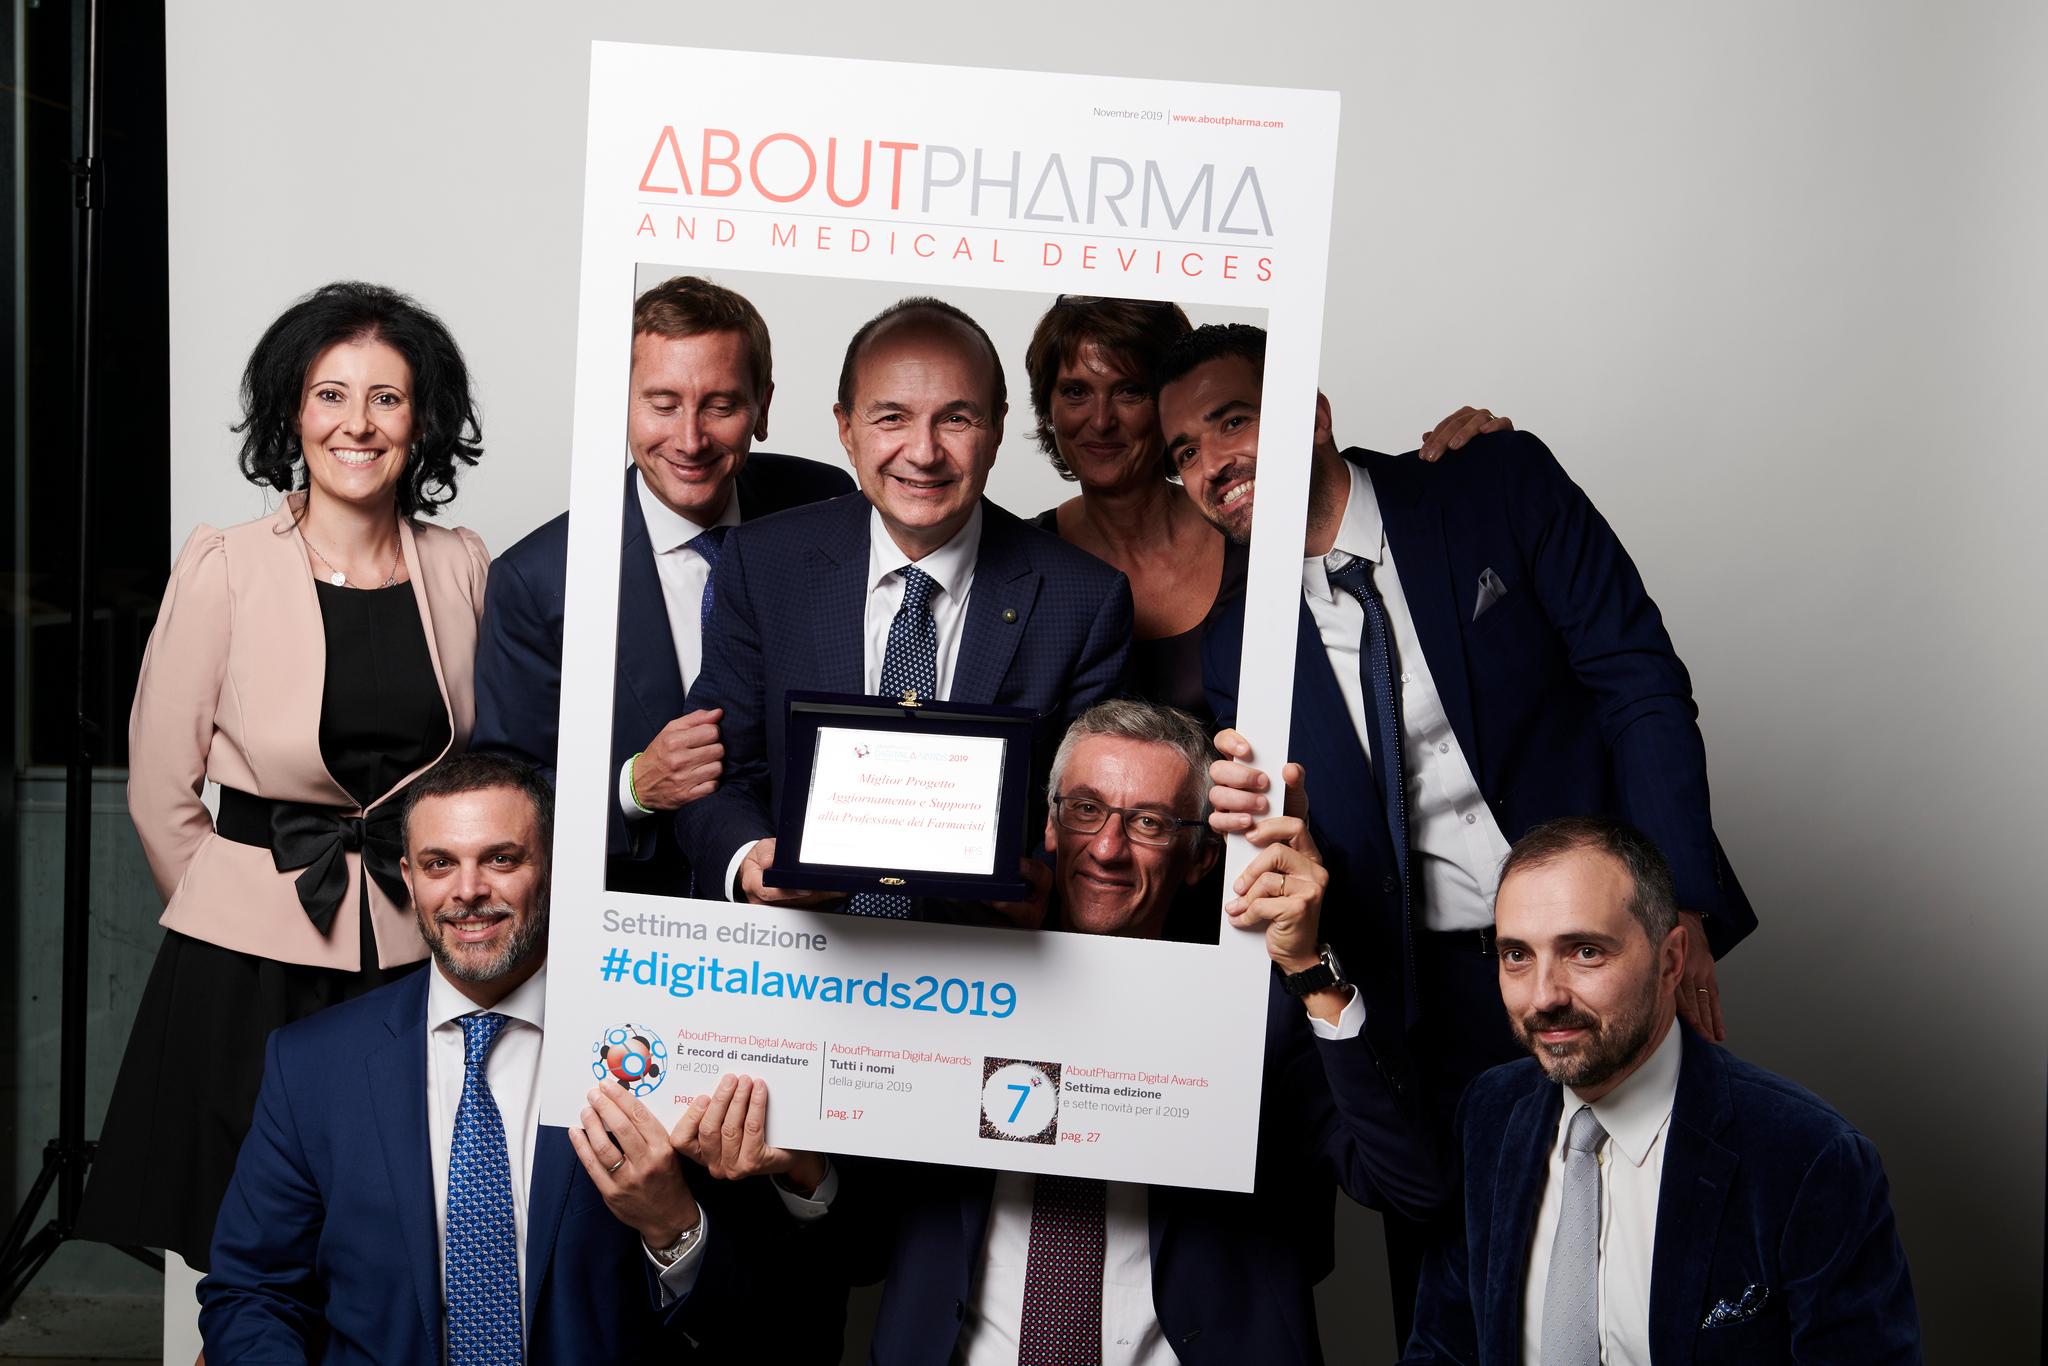 Photobooth AboutPharma Digital Awards 2019_78